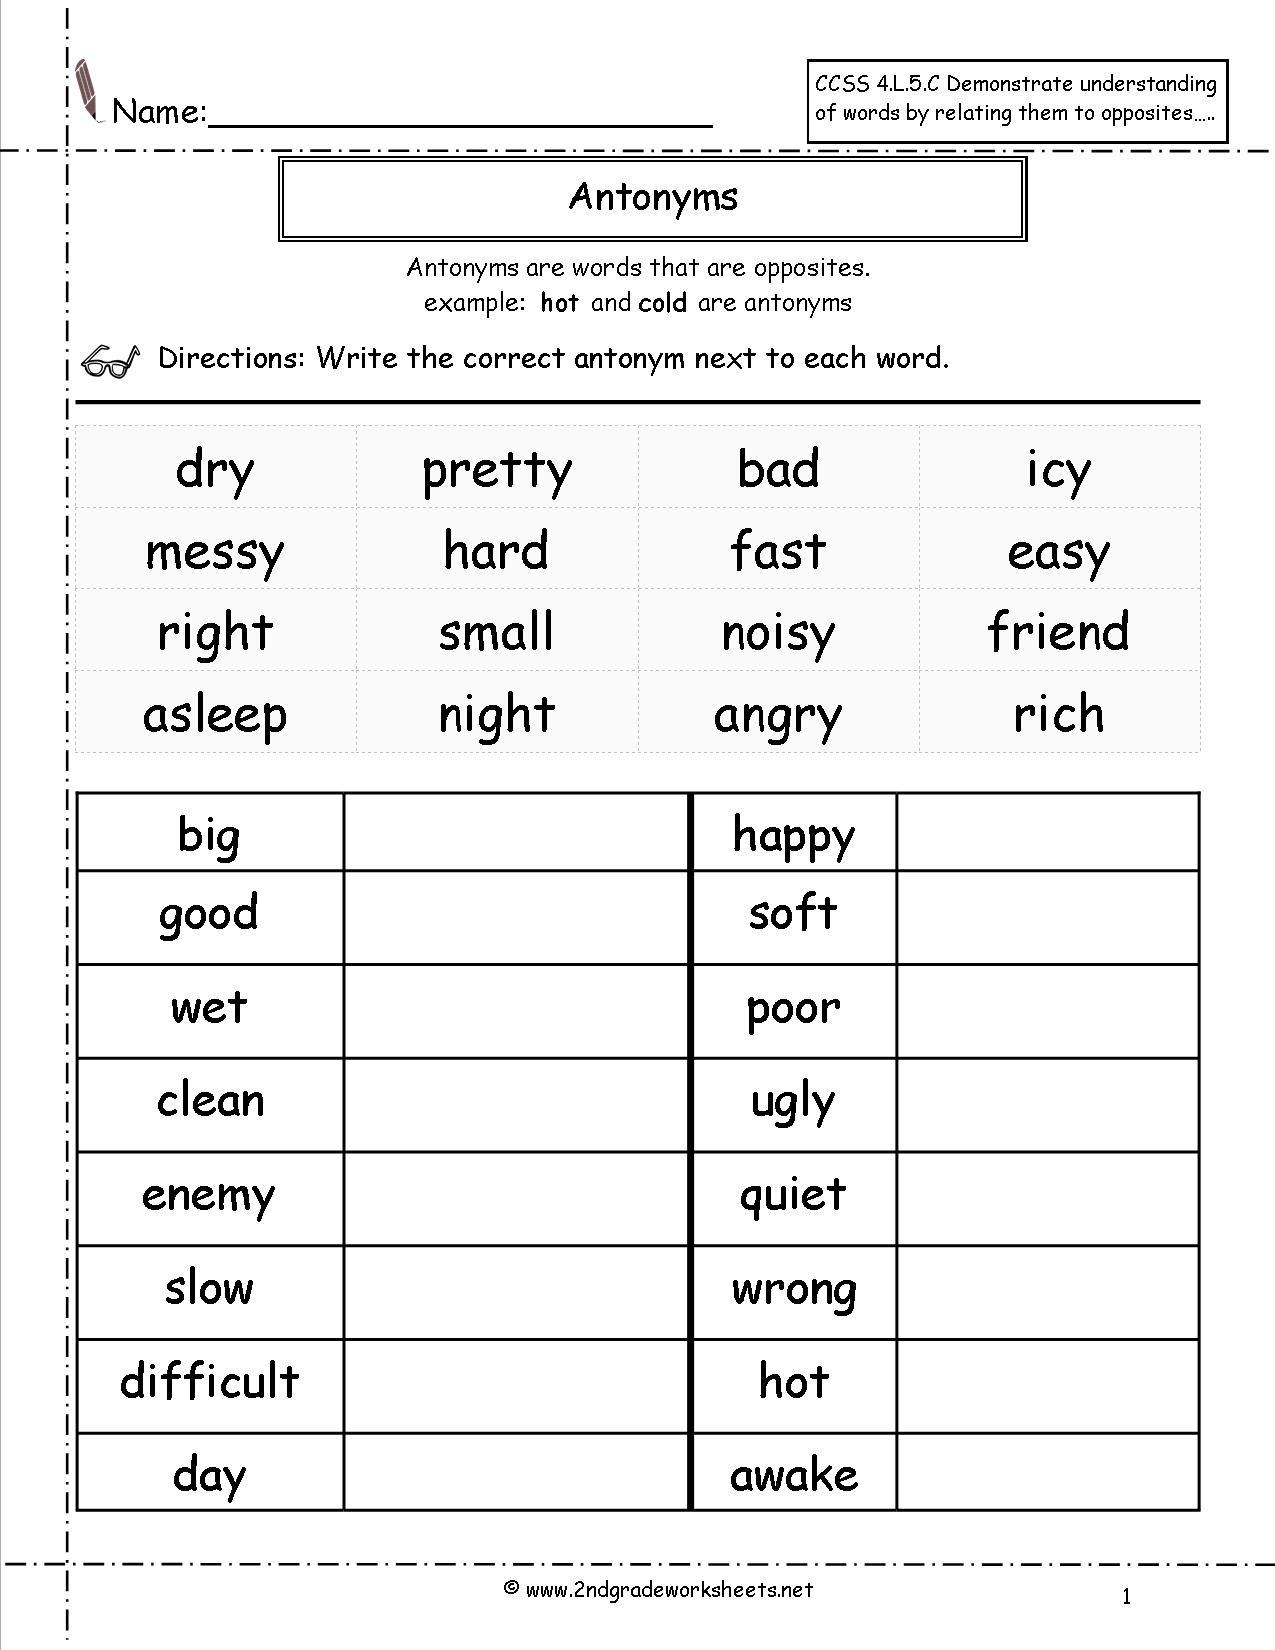 Synonyms And Antonyms Worksheets | Antonyms Printable Worksheets